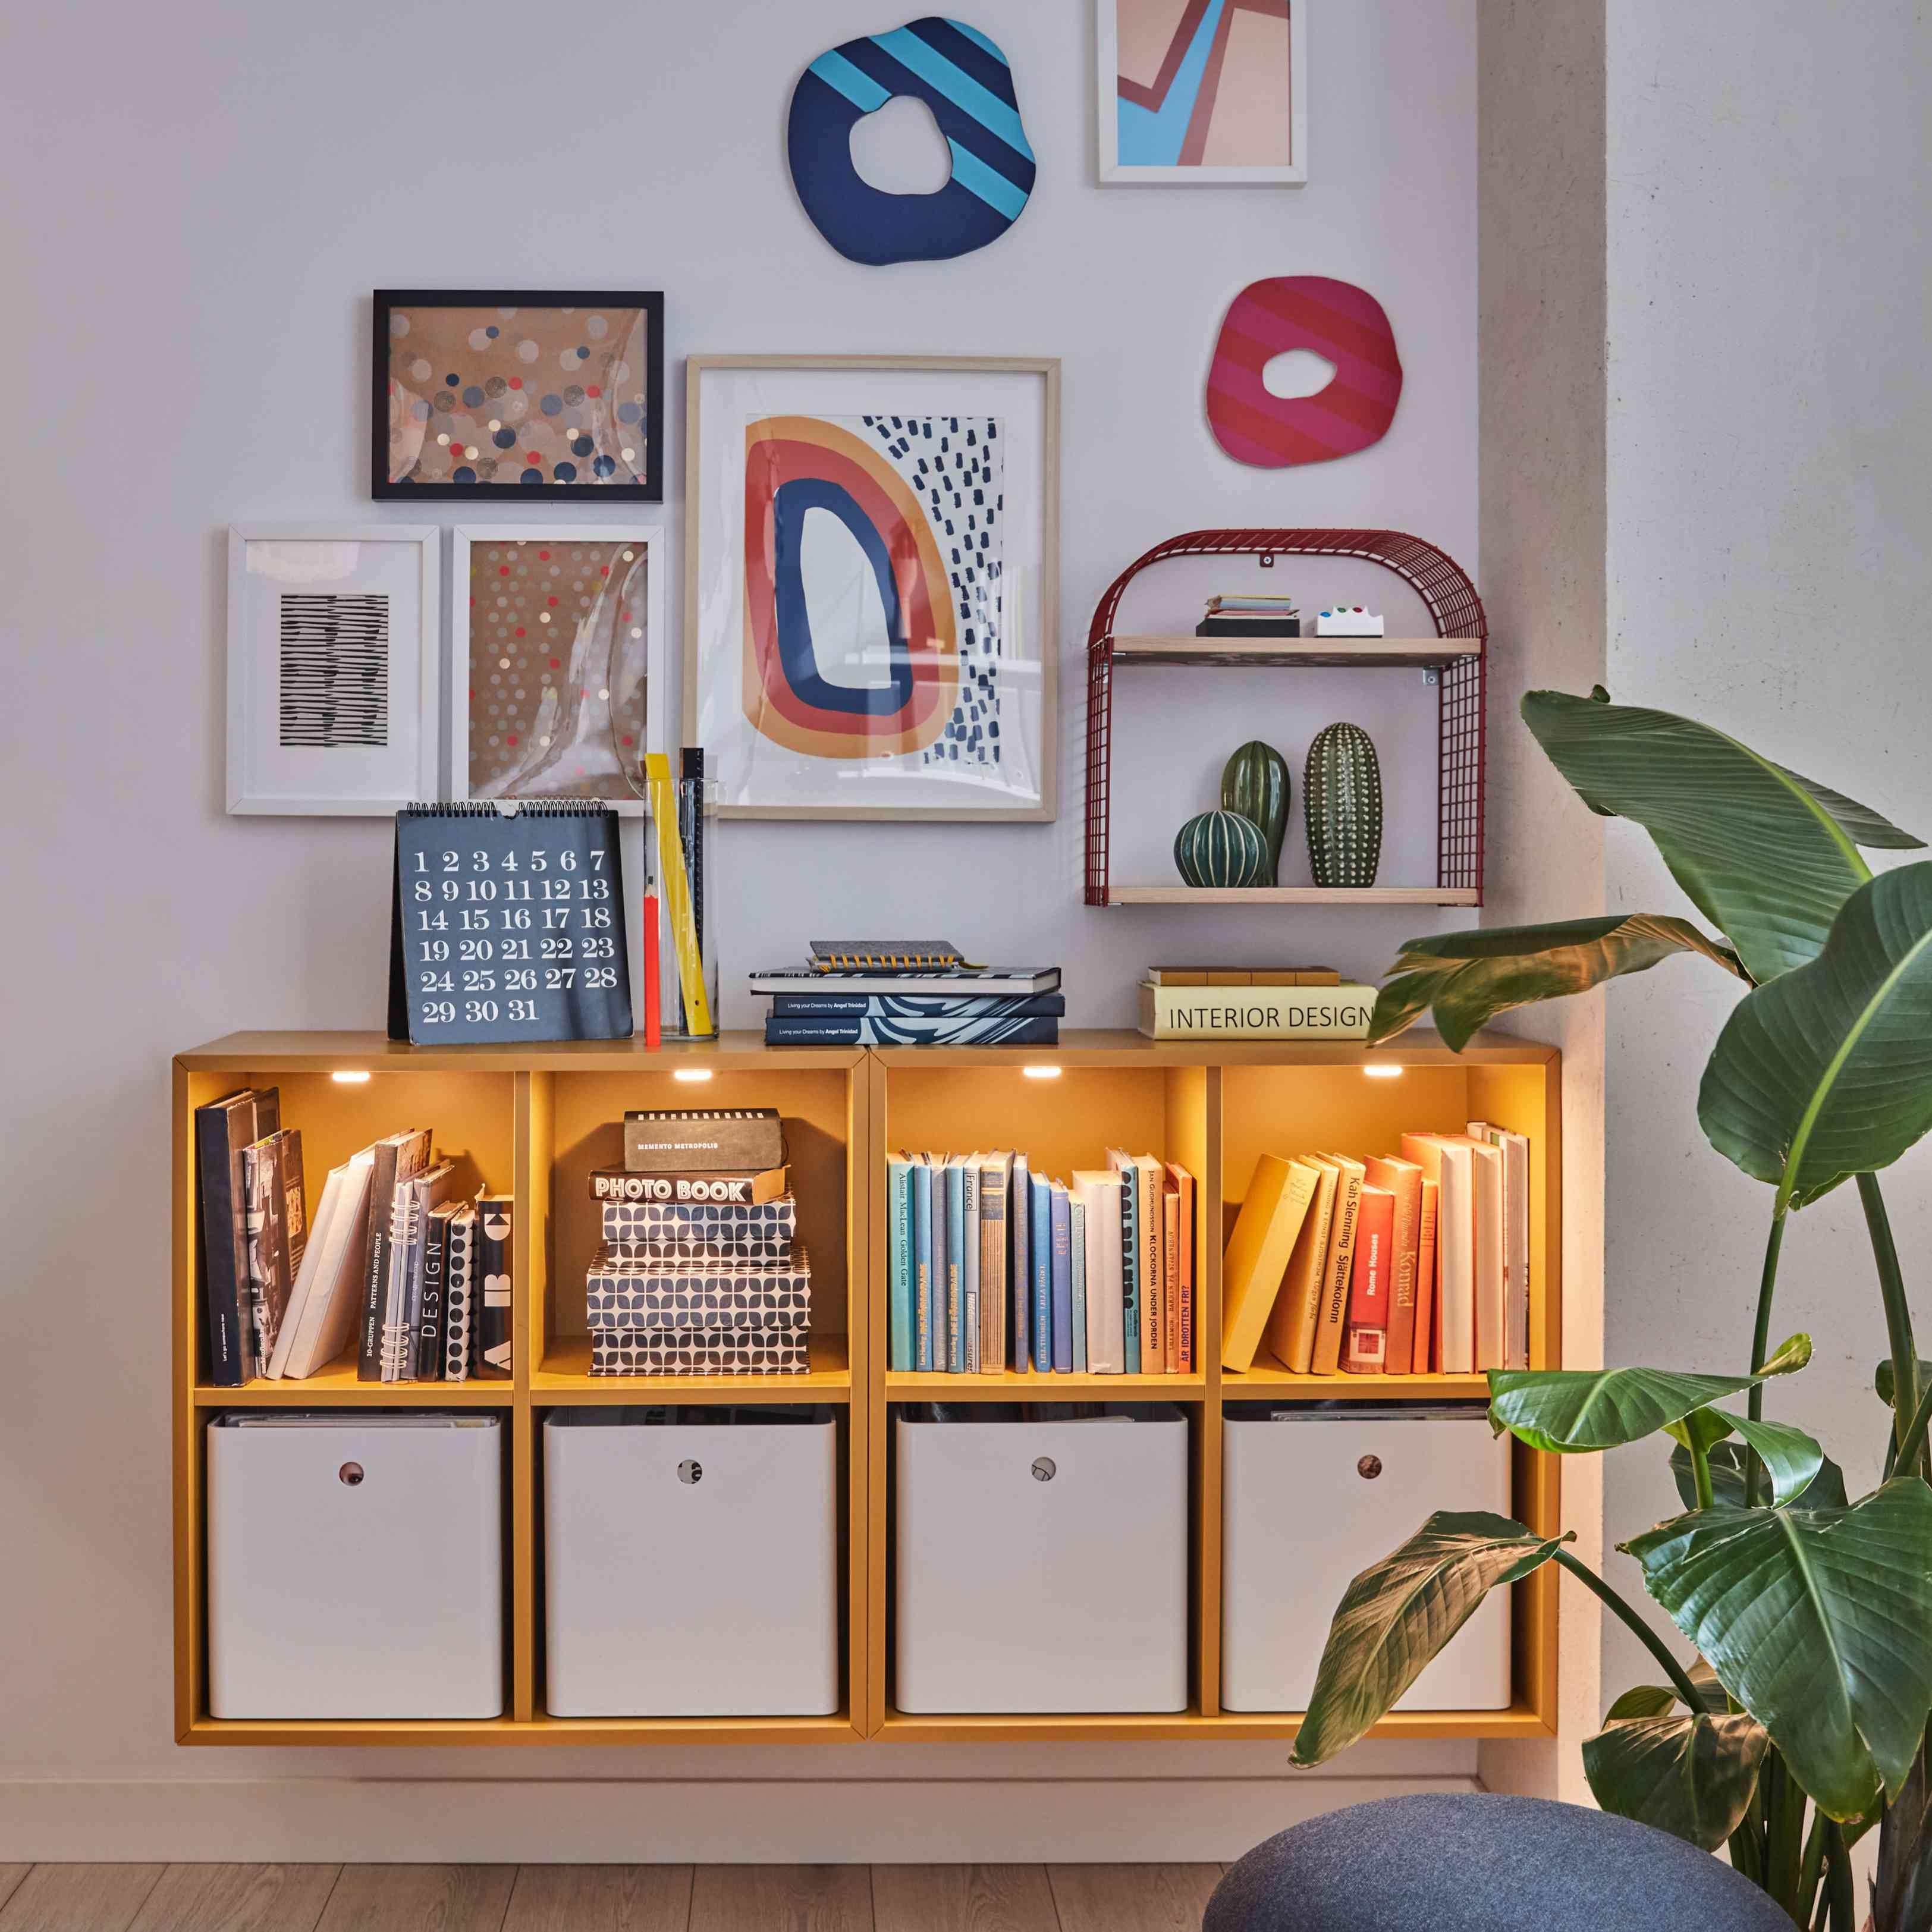 IKEA bookshelf with plants.